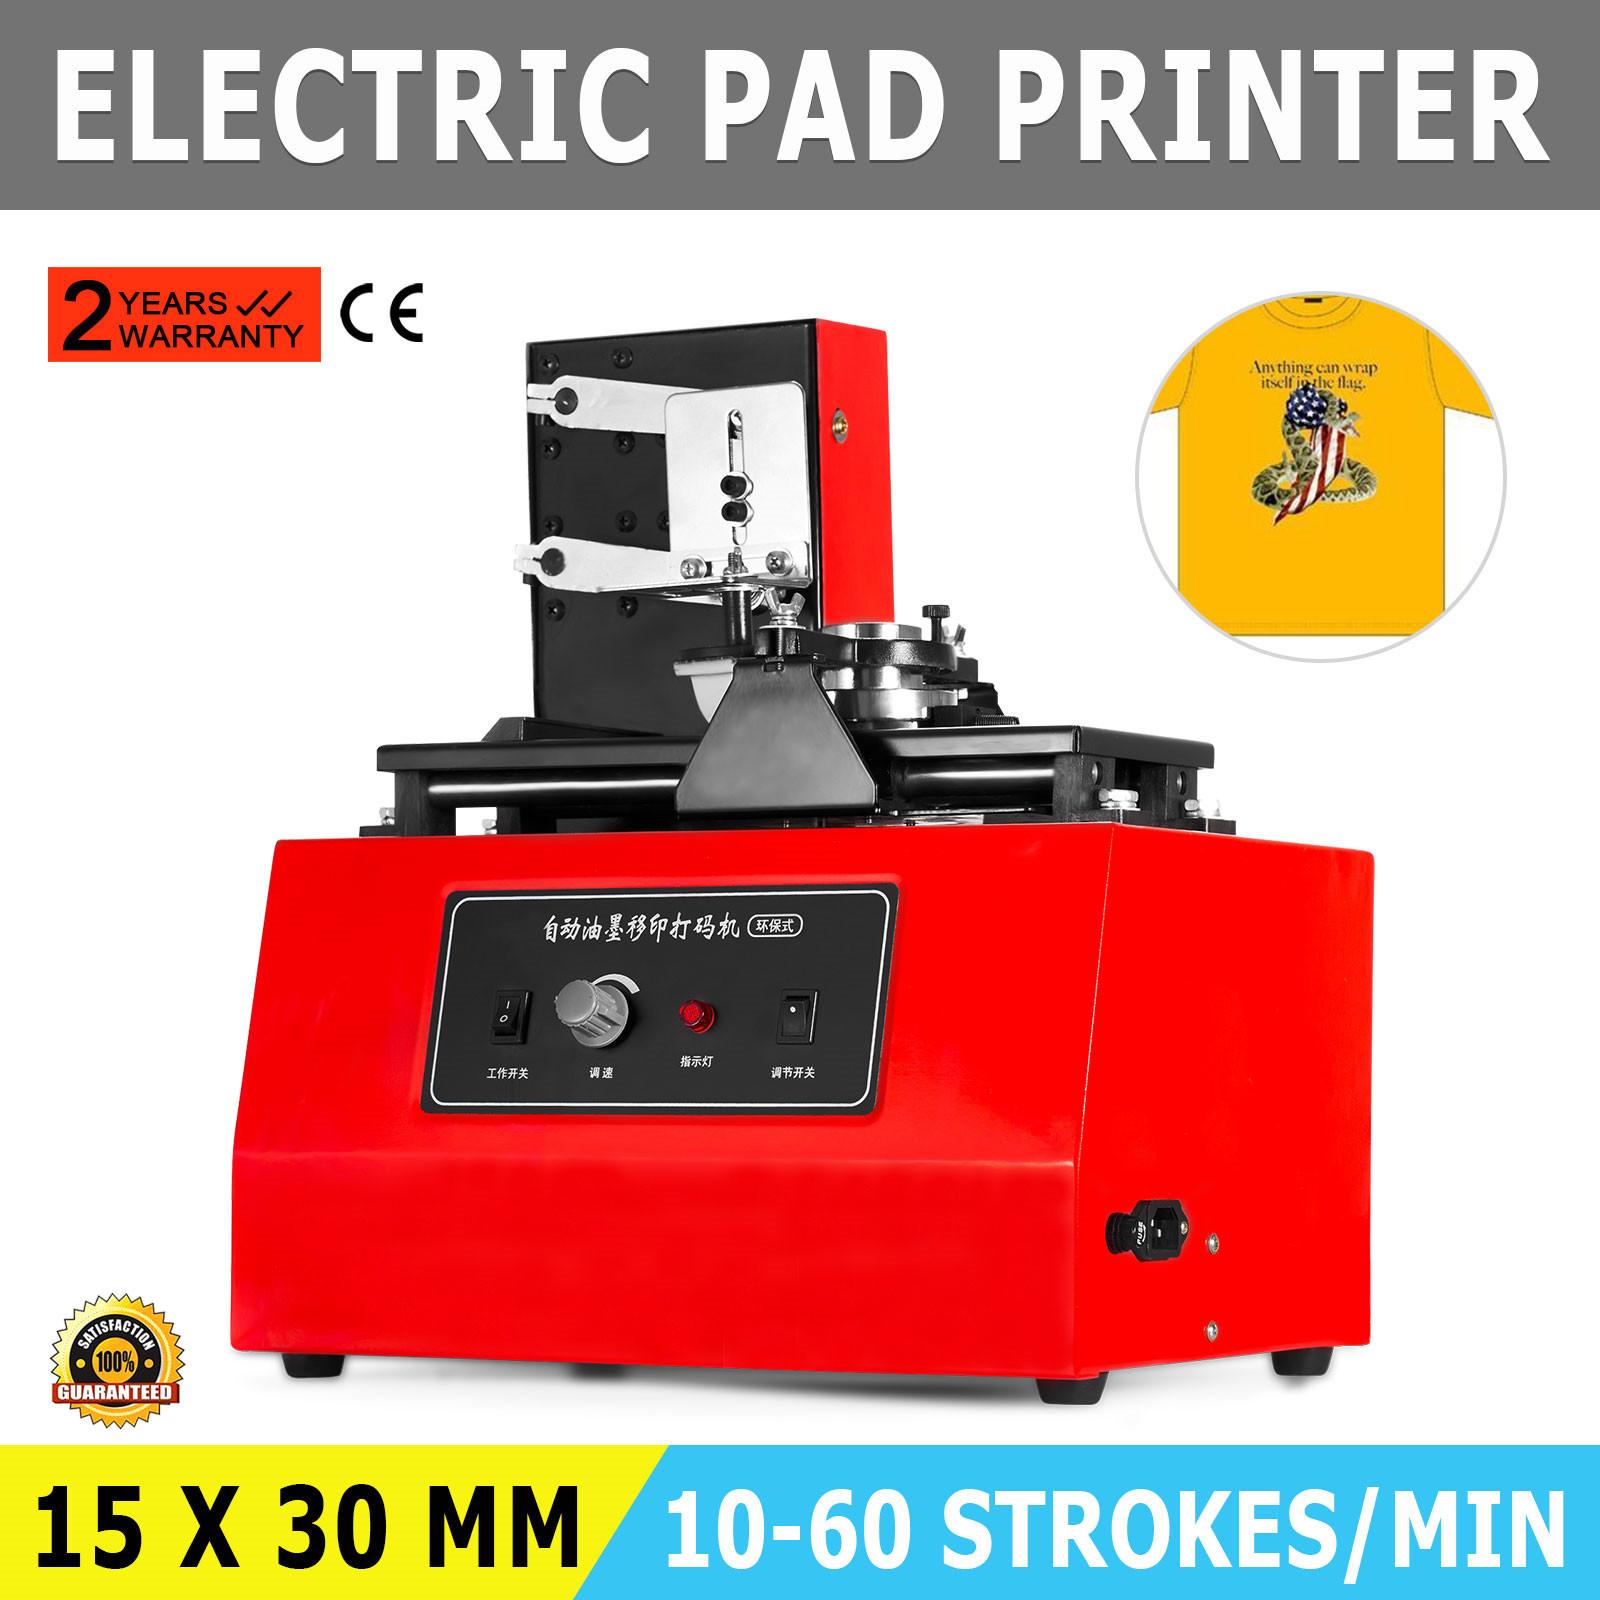 Diy Pad Printing Machine - DIY Campbellandkellarteam